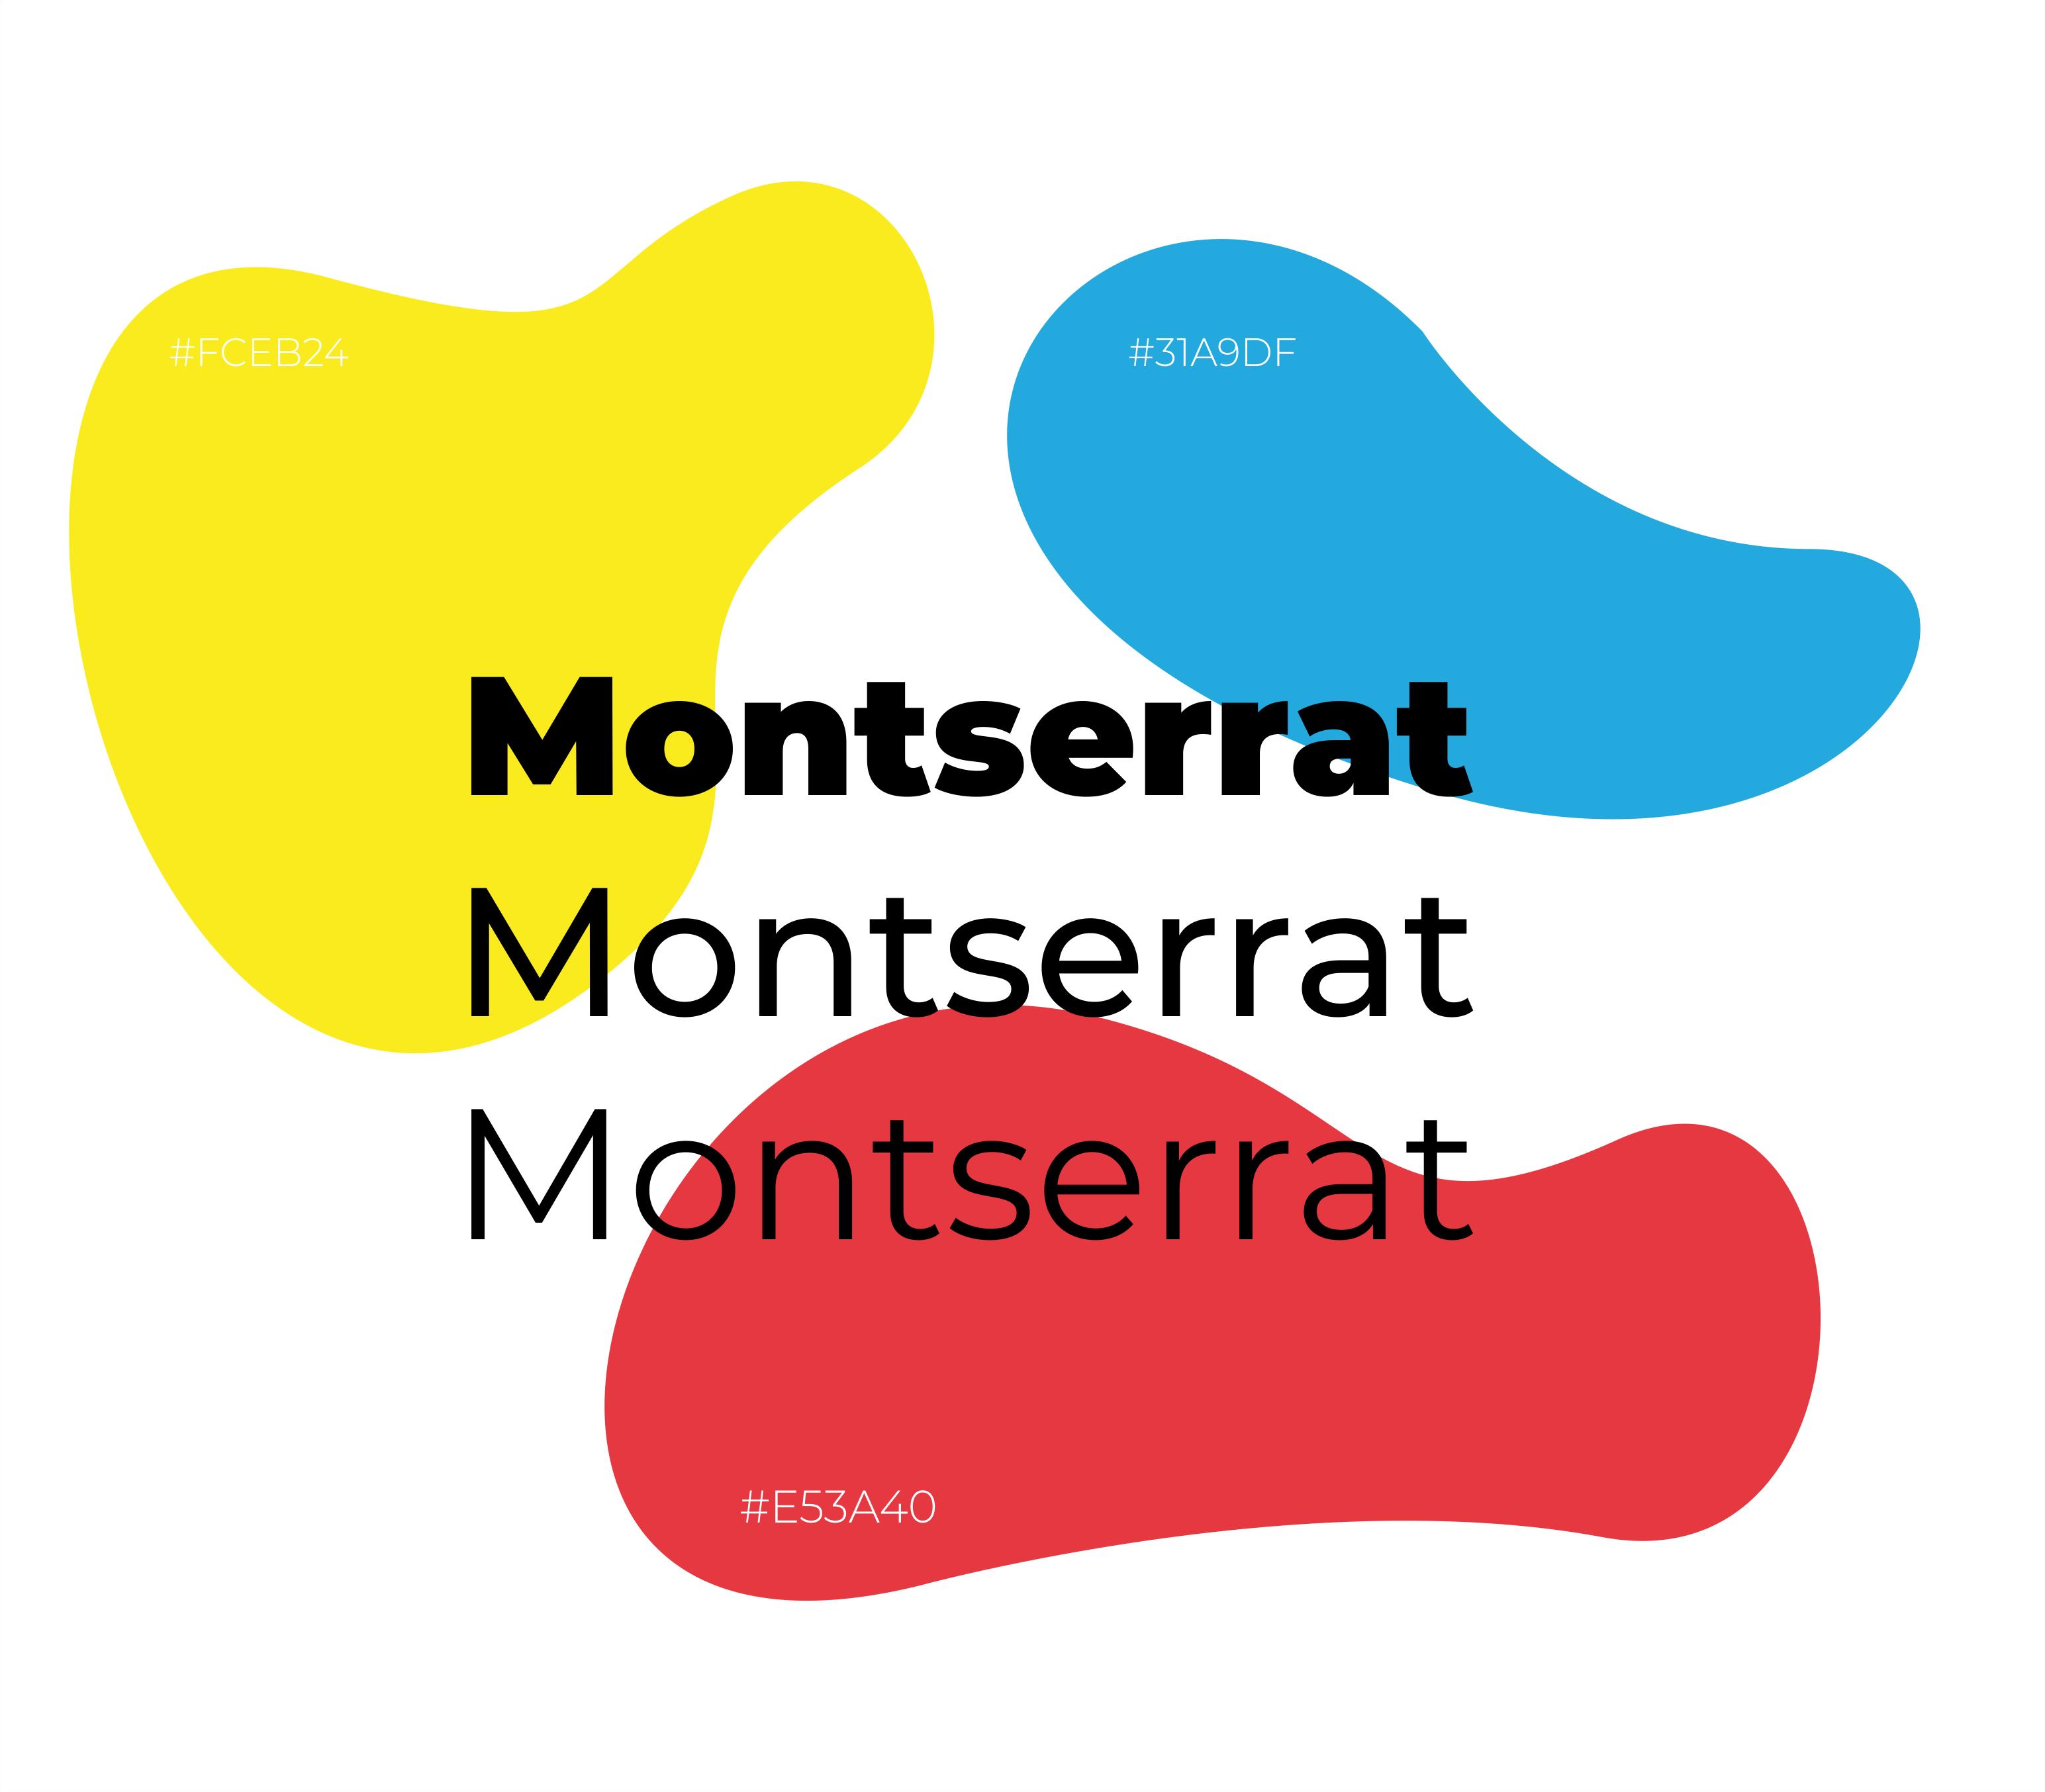 Разработка фирменного стиля на основании готового логотипа фото f_8855ab284138b699.png